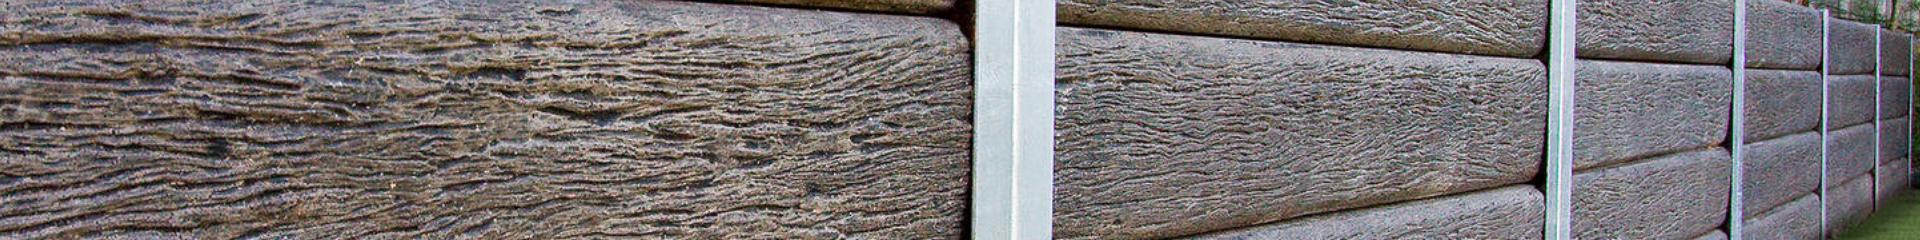 Ridgi Concrete wall